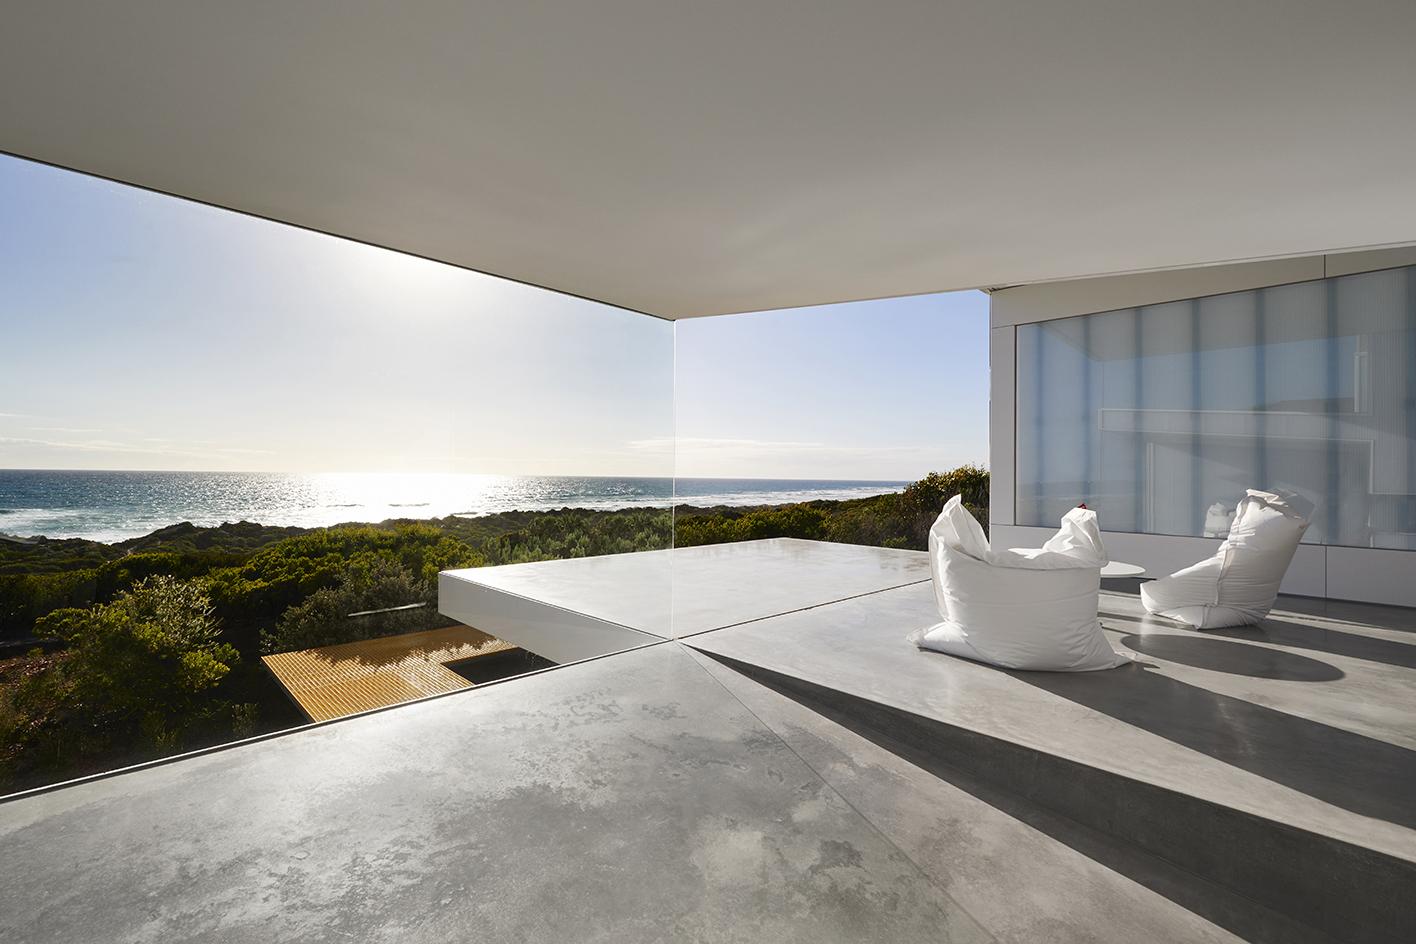 architect robin williams  australian beach house is a beach house album review beach house album release date